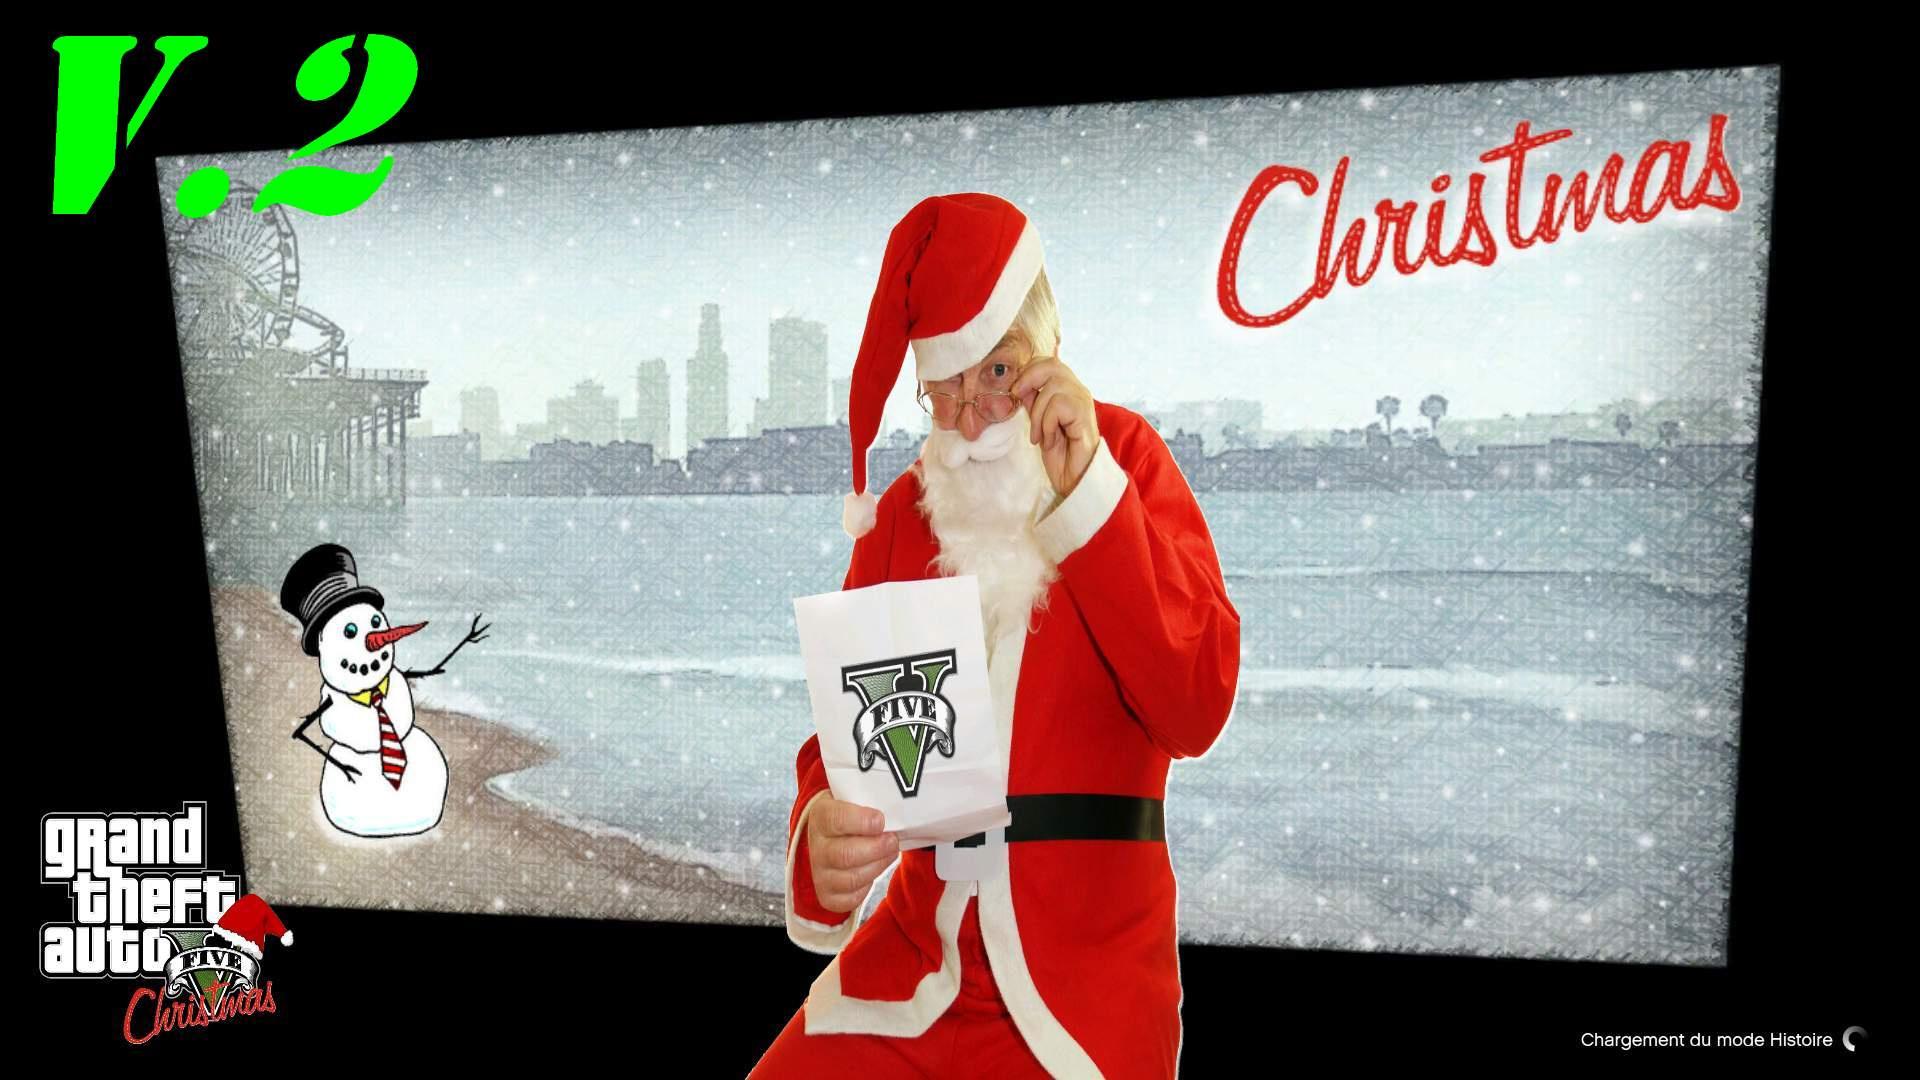 Gta 5 Christmas.Christmas Loading Screens Gta5 Mods Com